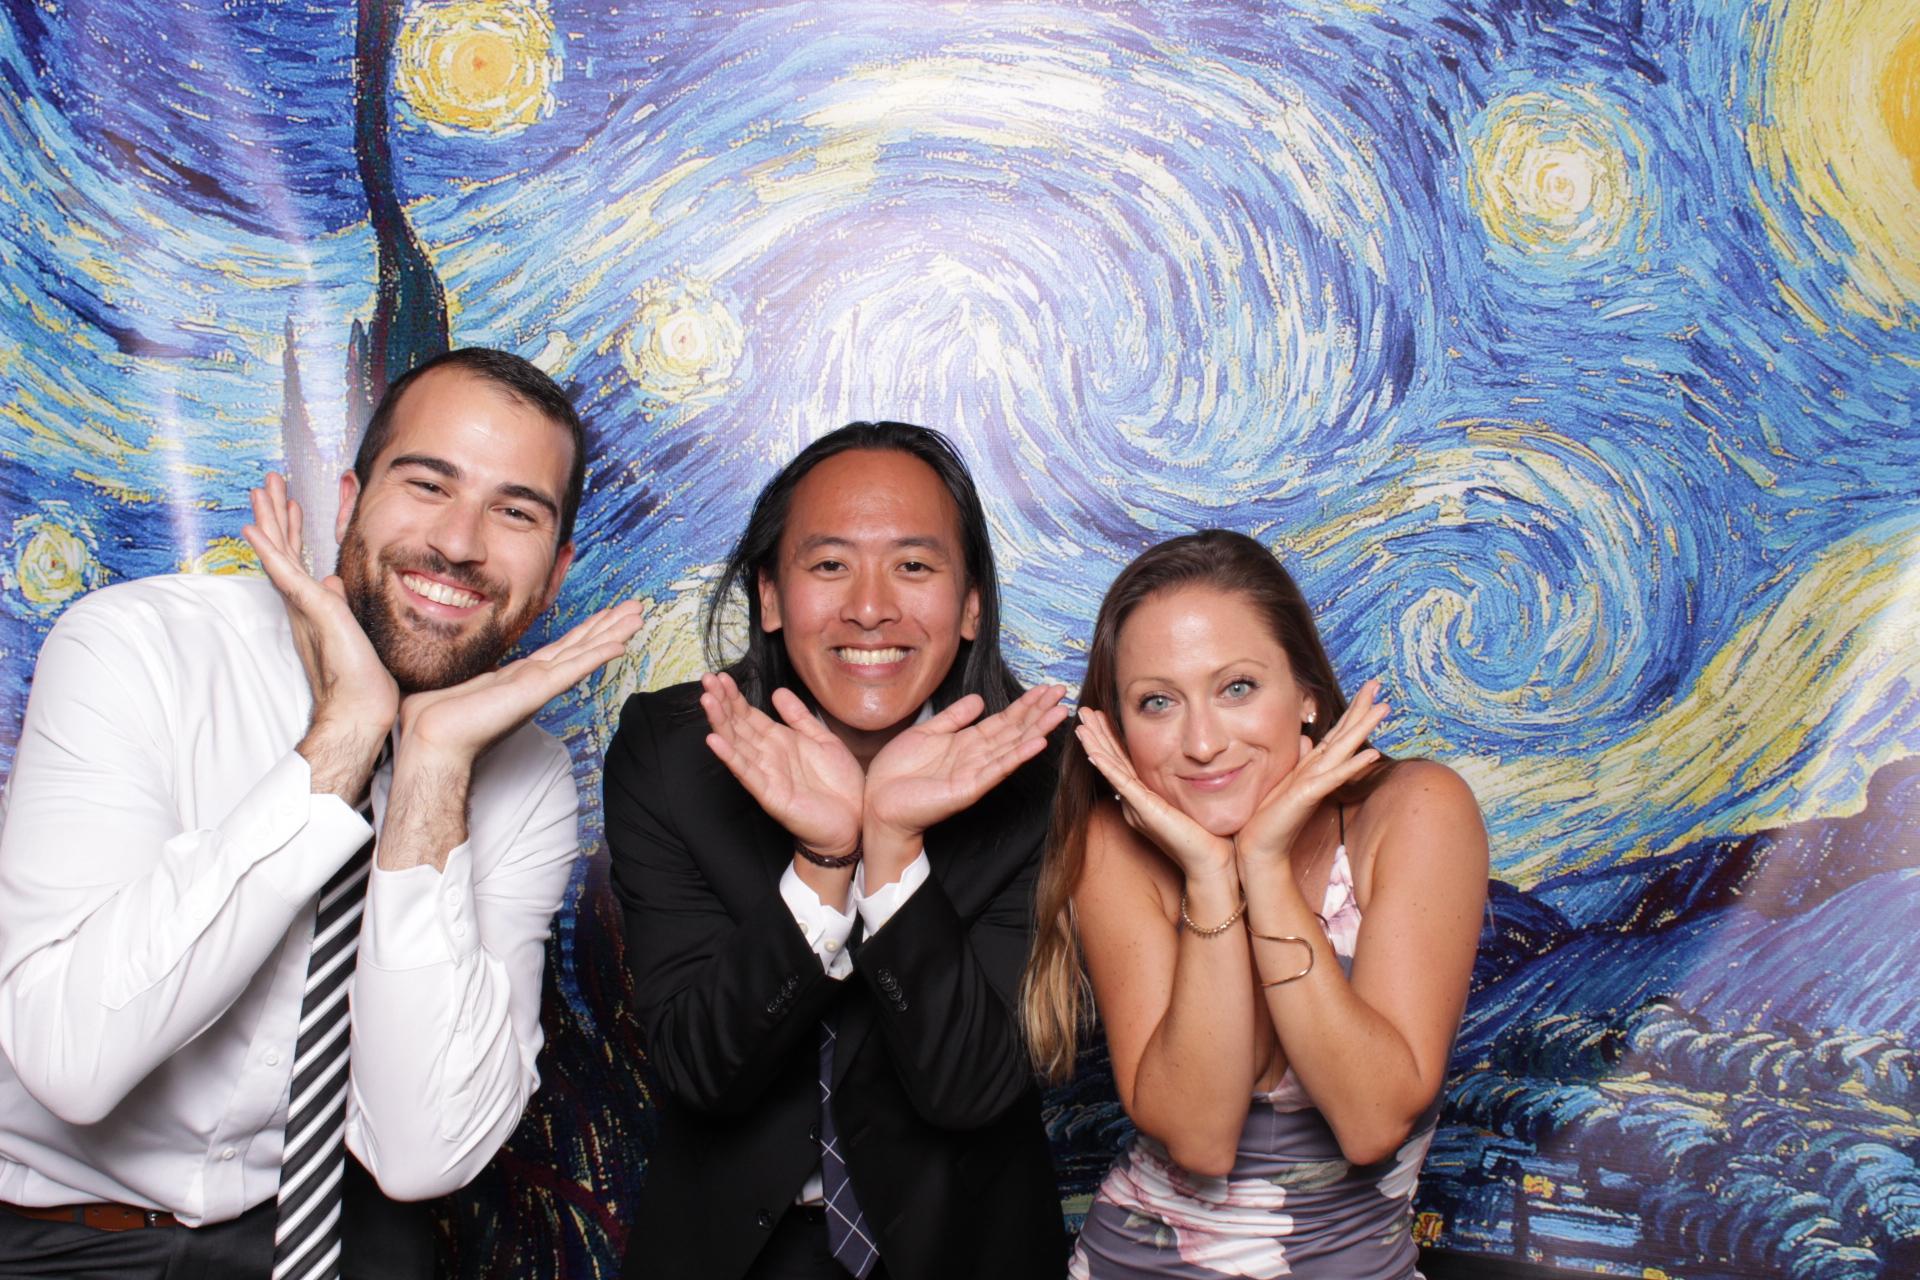 _Minneapolis_aria_Wedding_photo_booth_rental (7).jpg